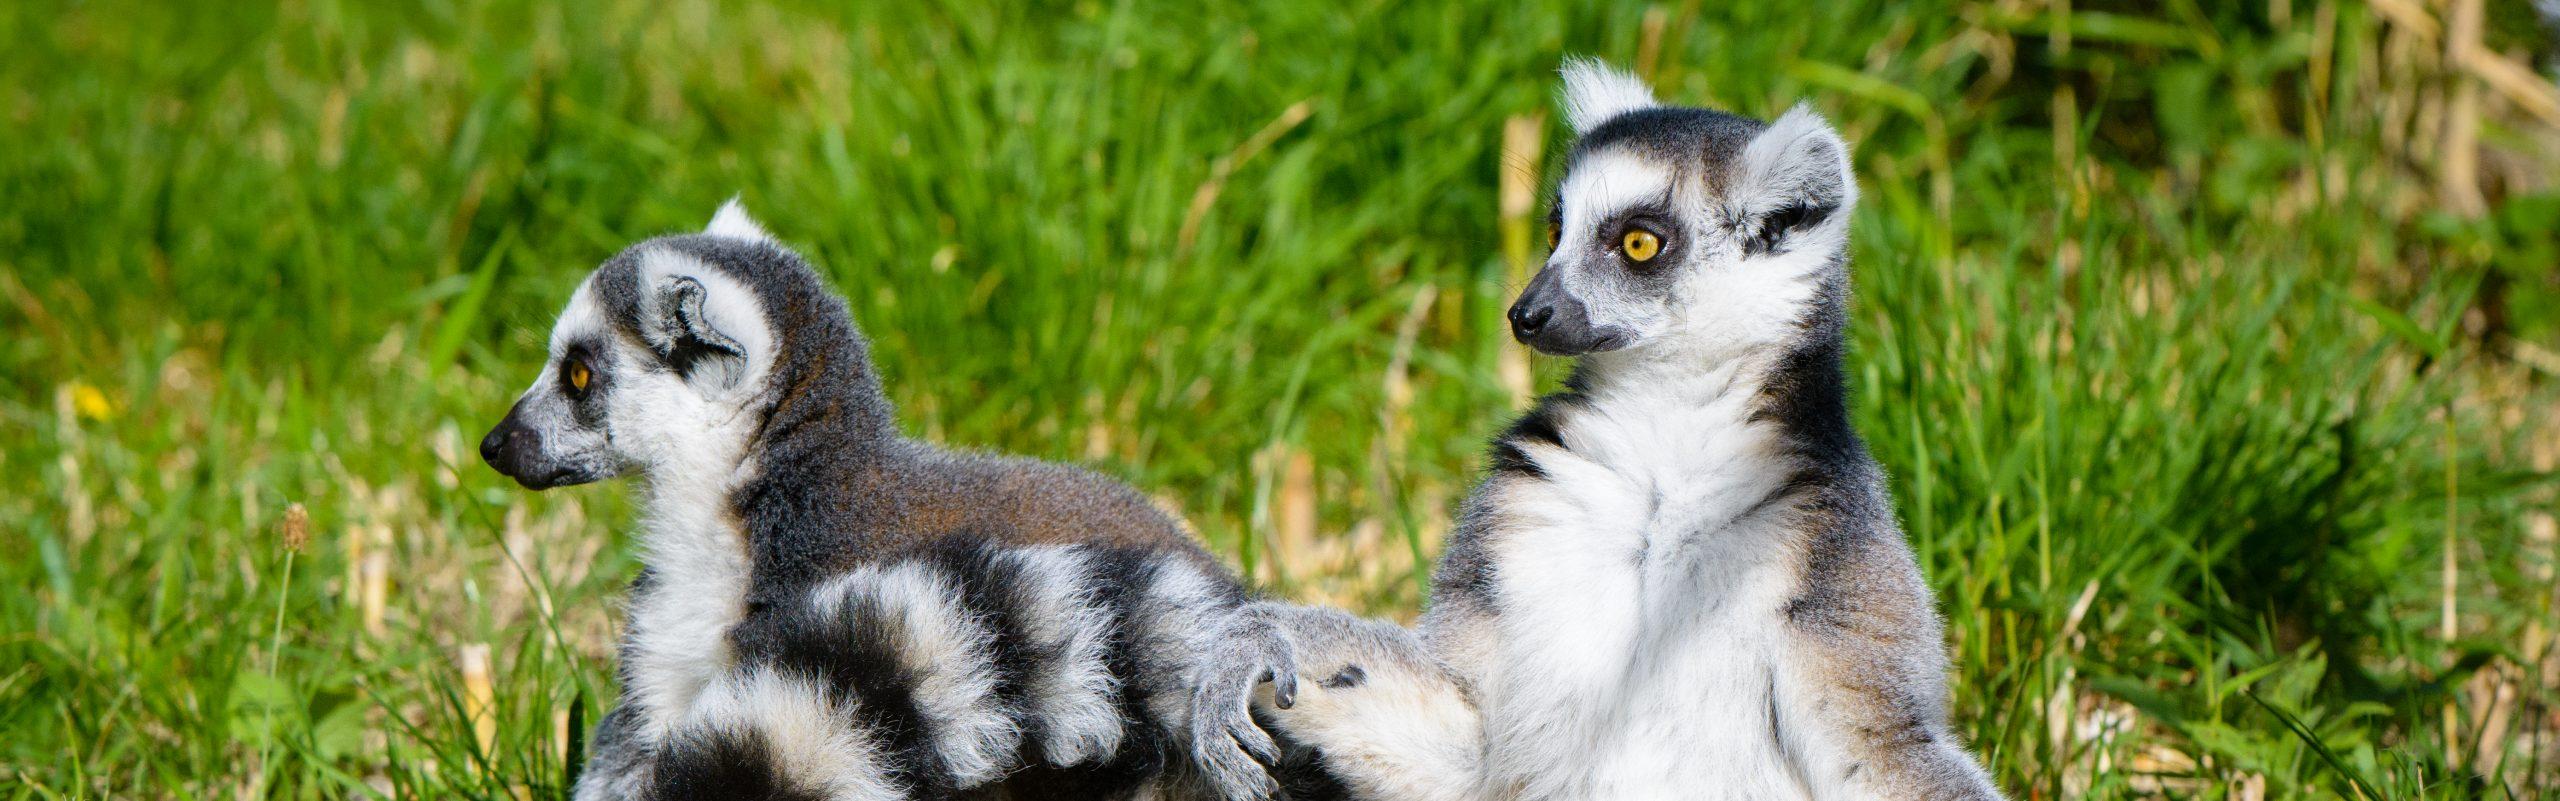 https://faunafocus.com/home/november-2018-ring-tailed-lemur/#jp-carousel-11926